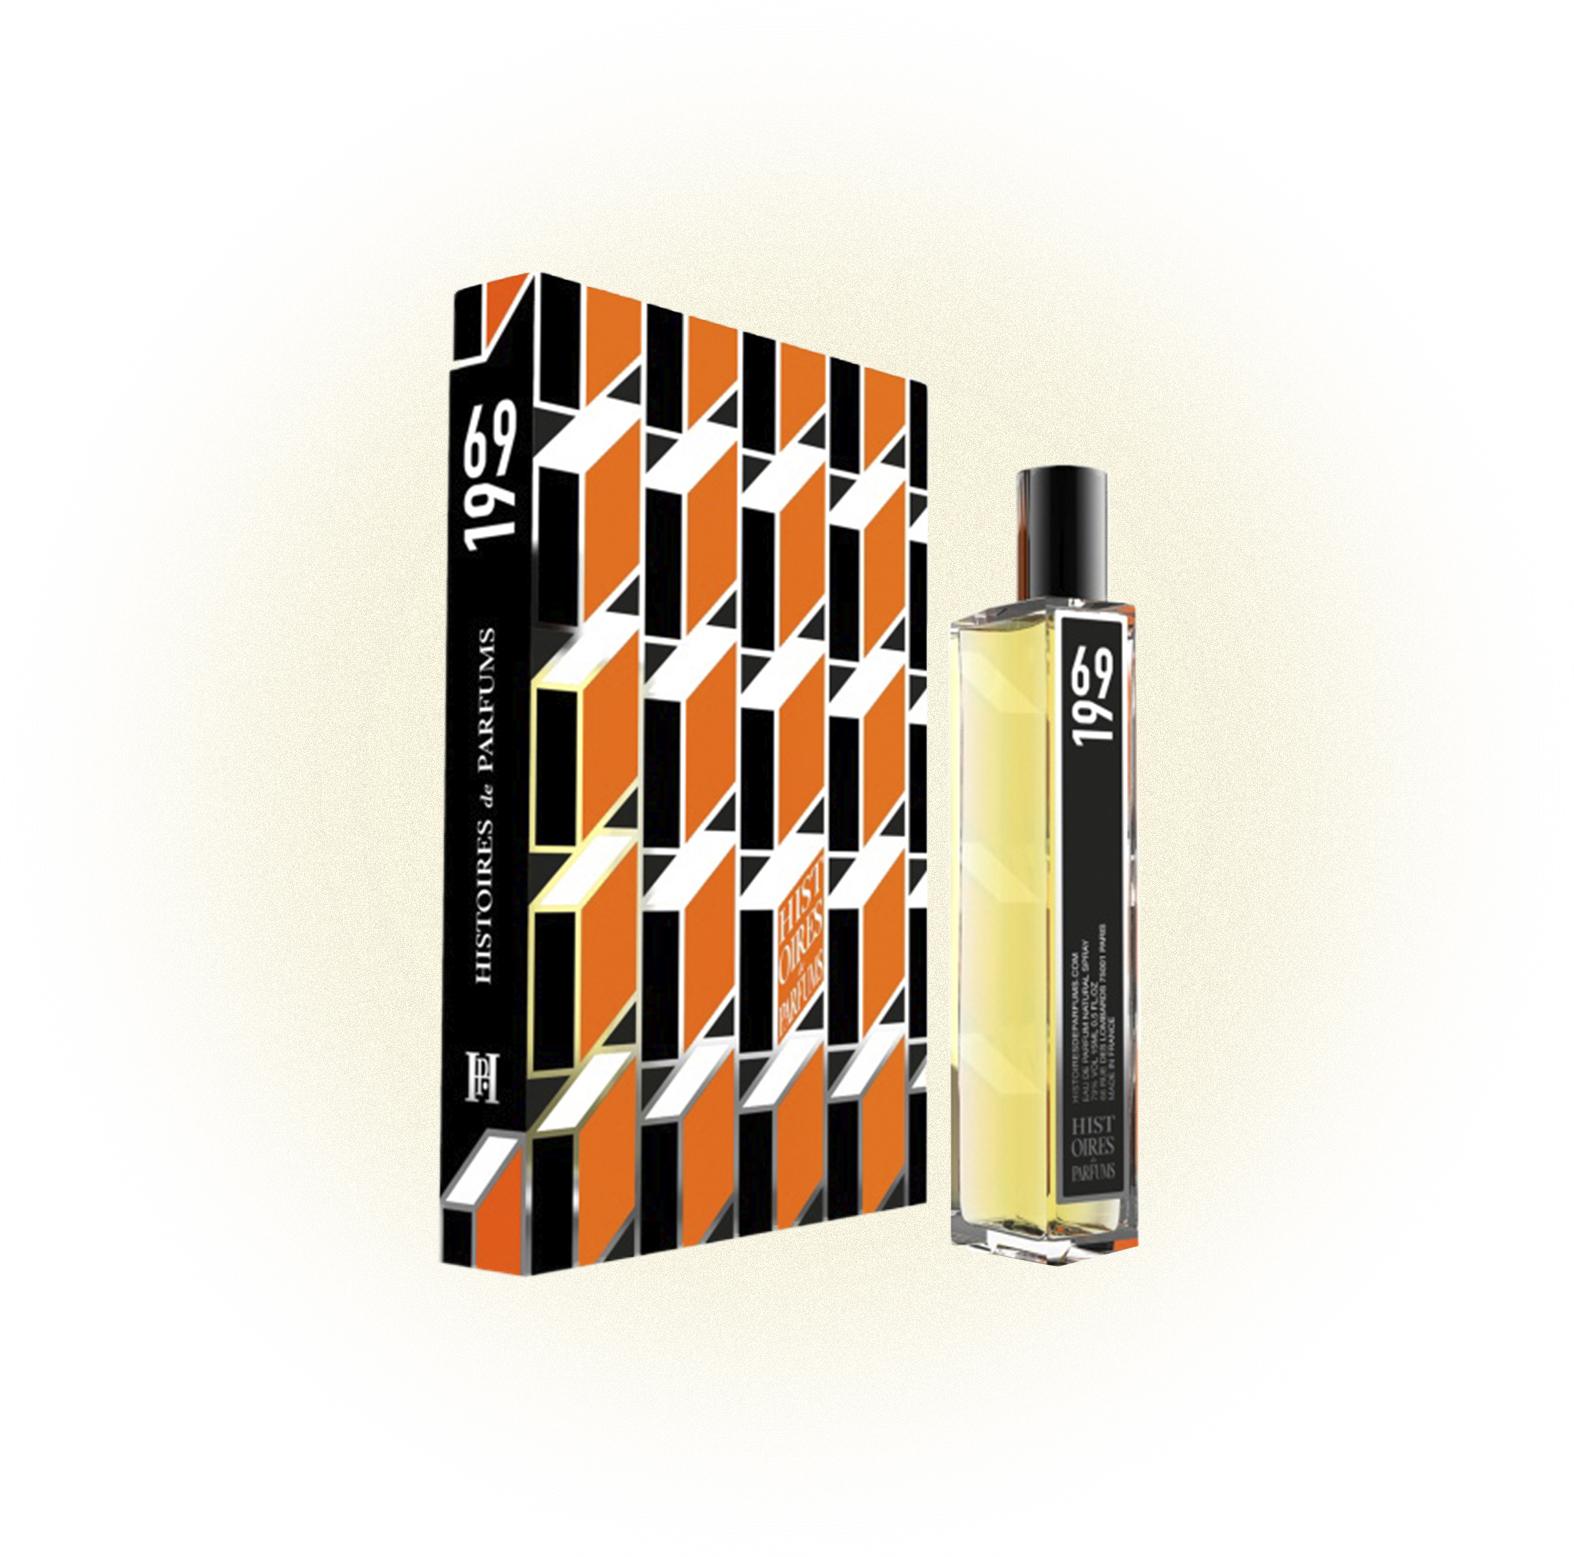 1969, Histories de Parfums, 15 мл